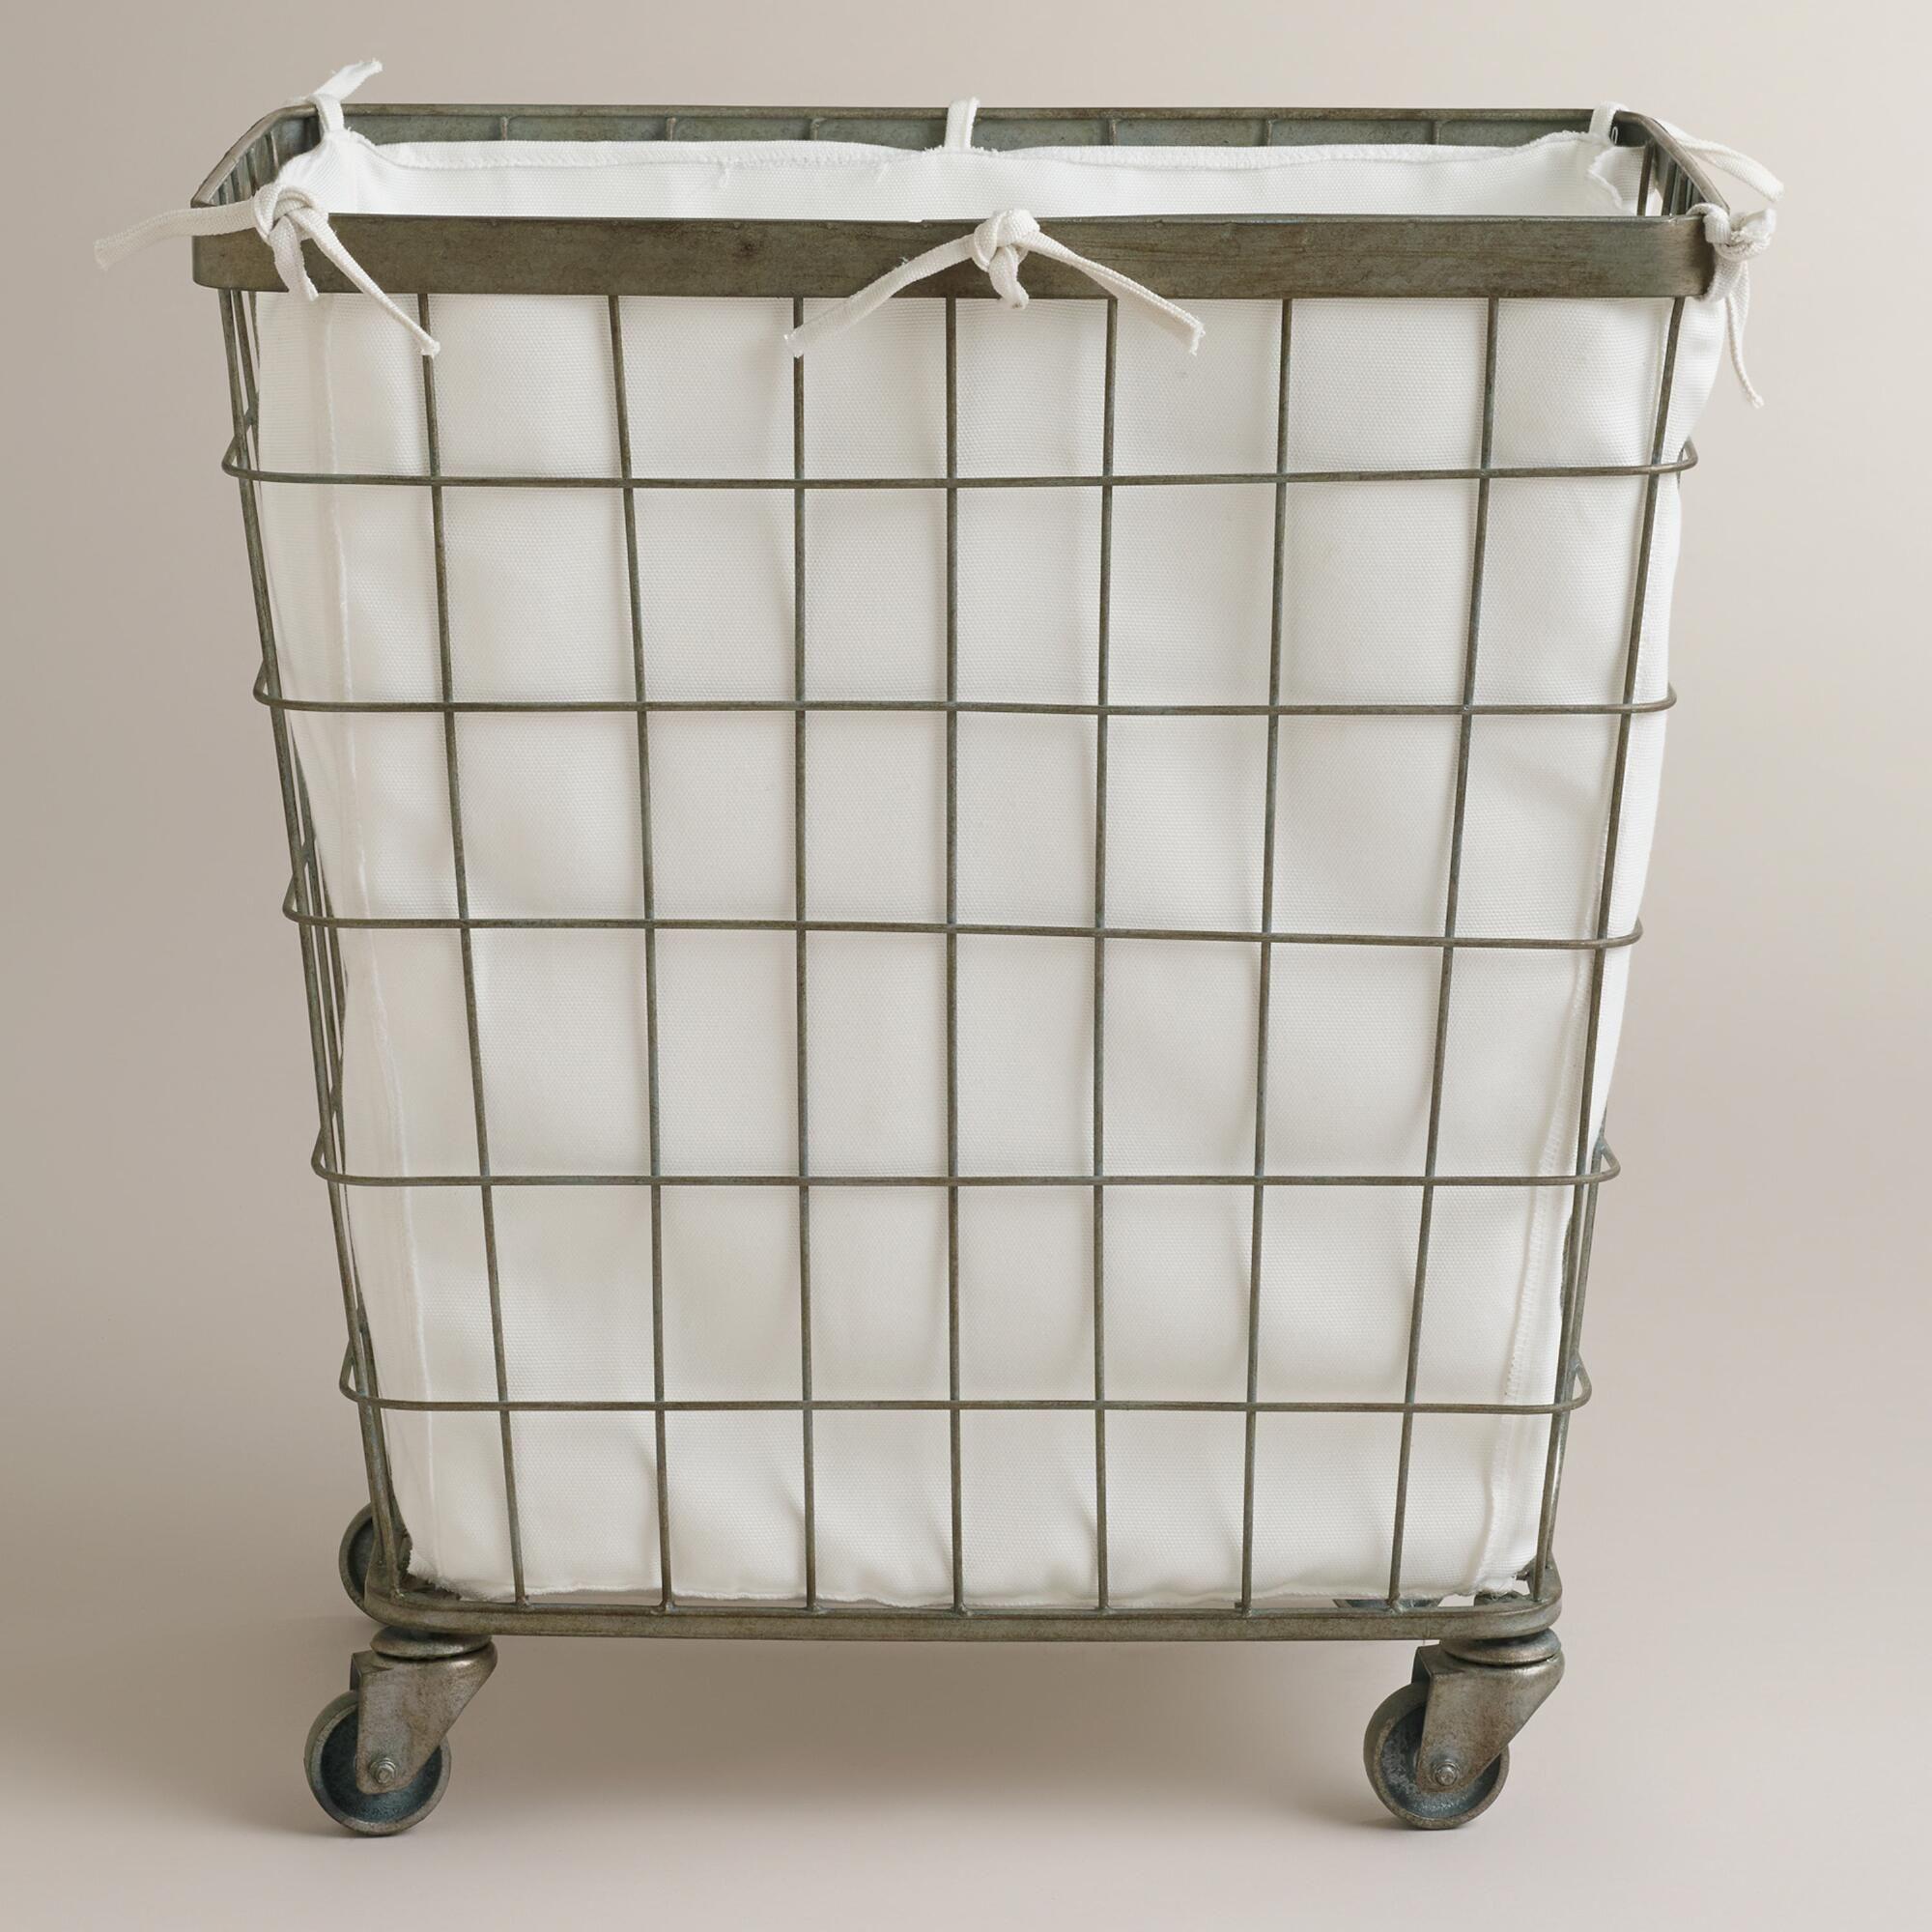 Ellie Rolling Hamper Metal Laundry Basket Basement Laundry Room